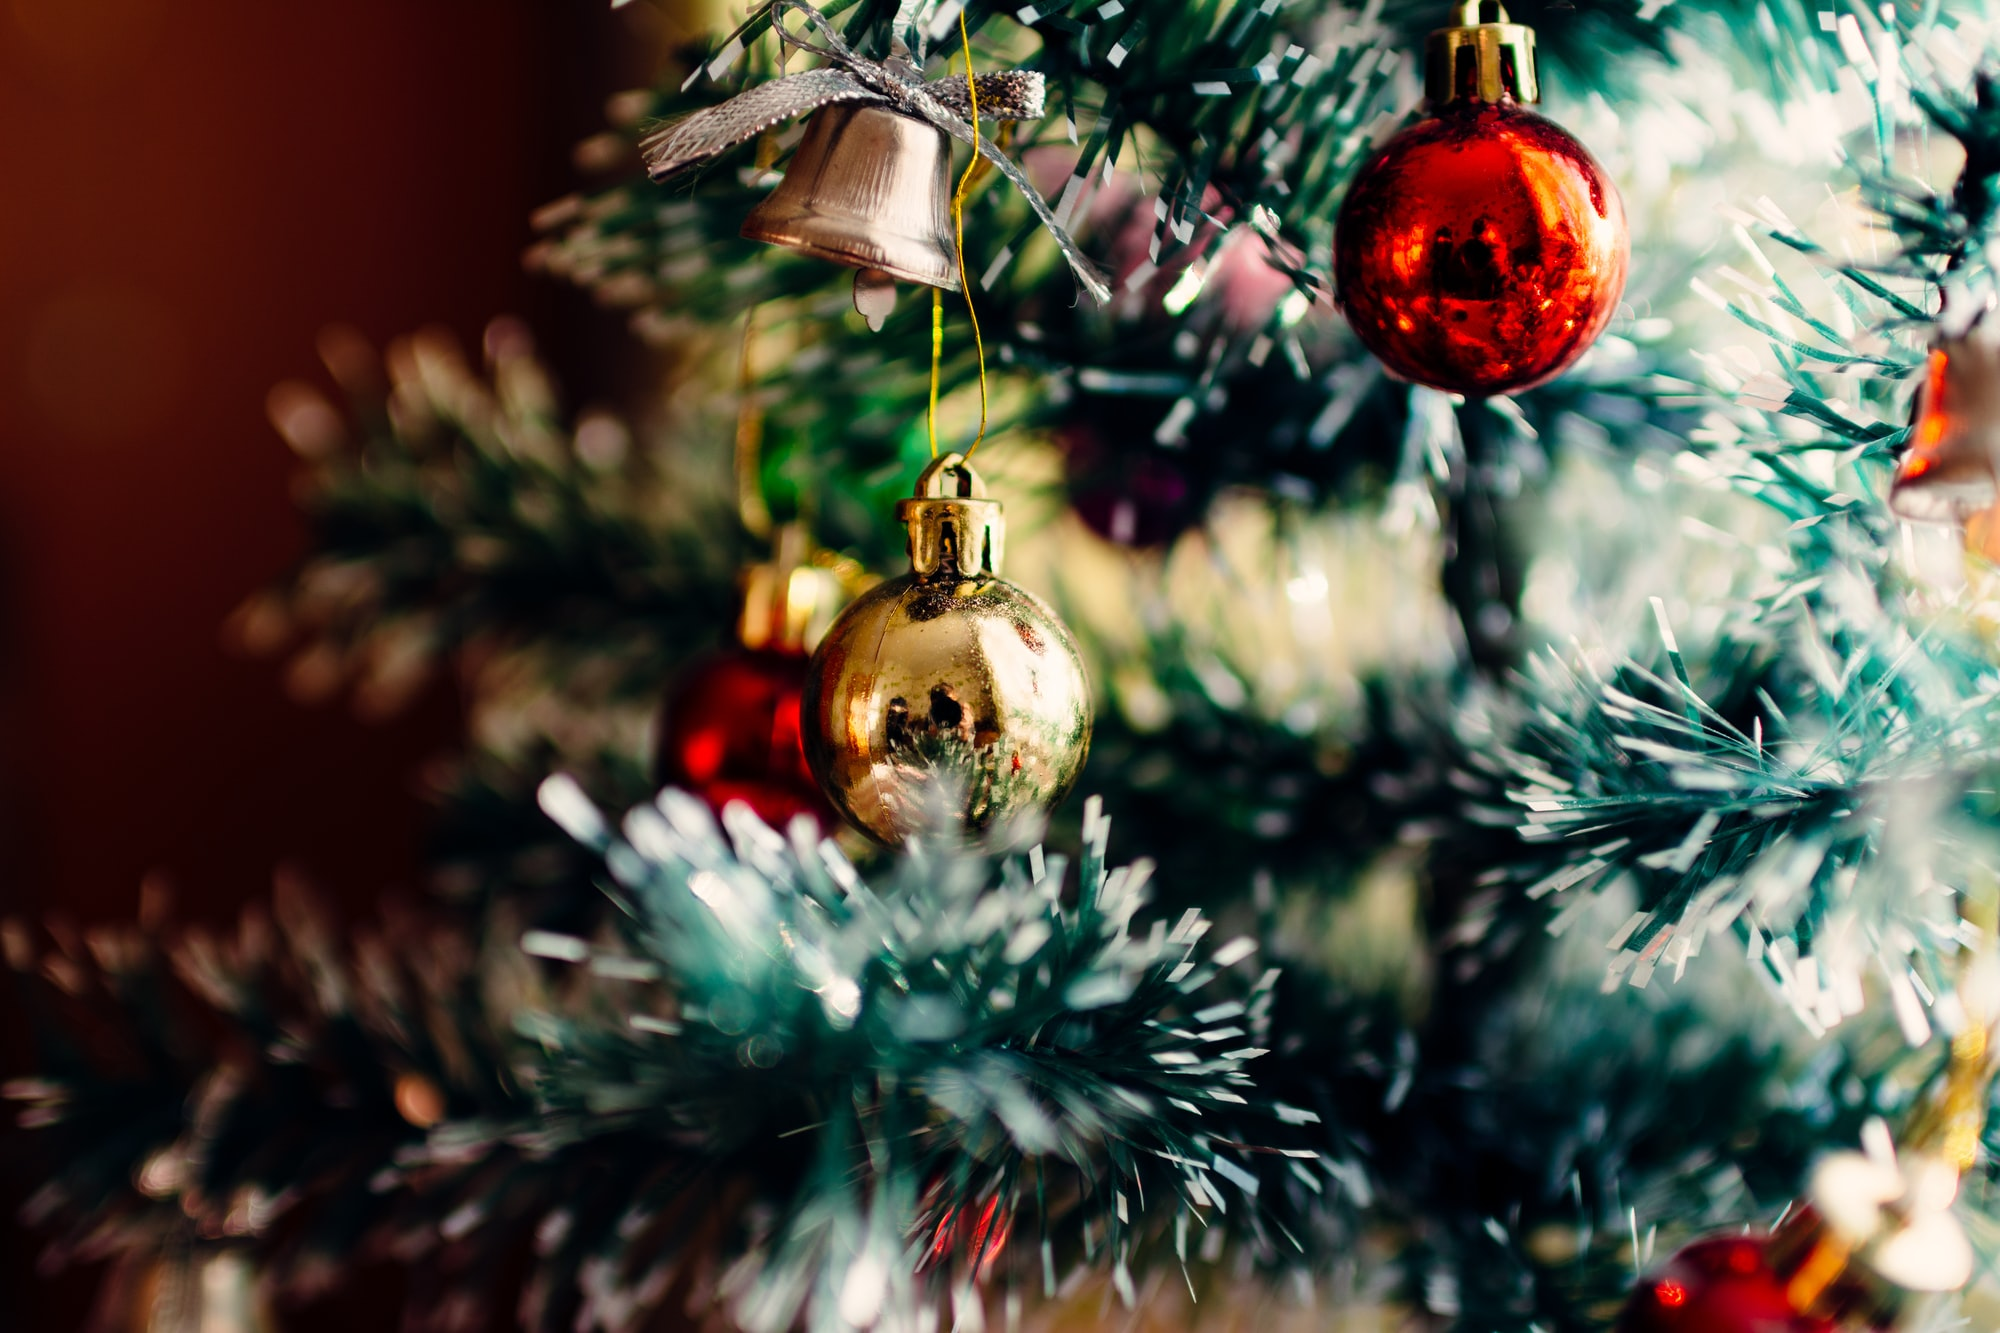 BUG Jingle Bell Jam December 16, 2020